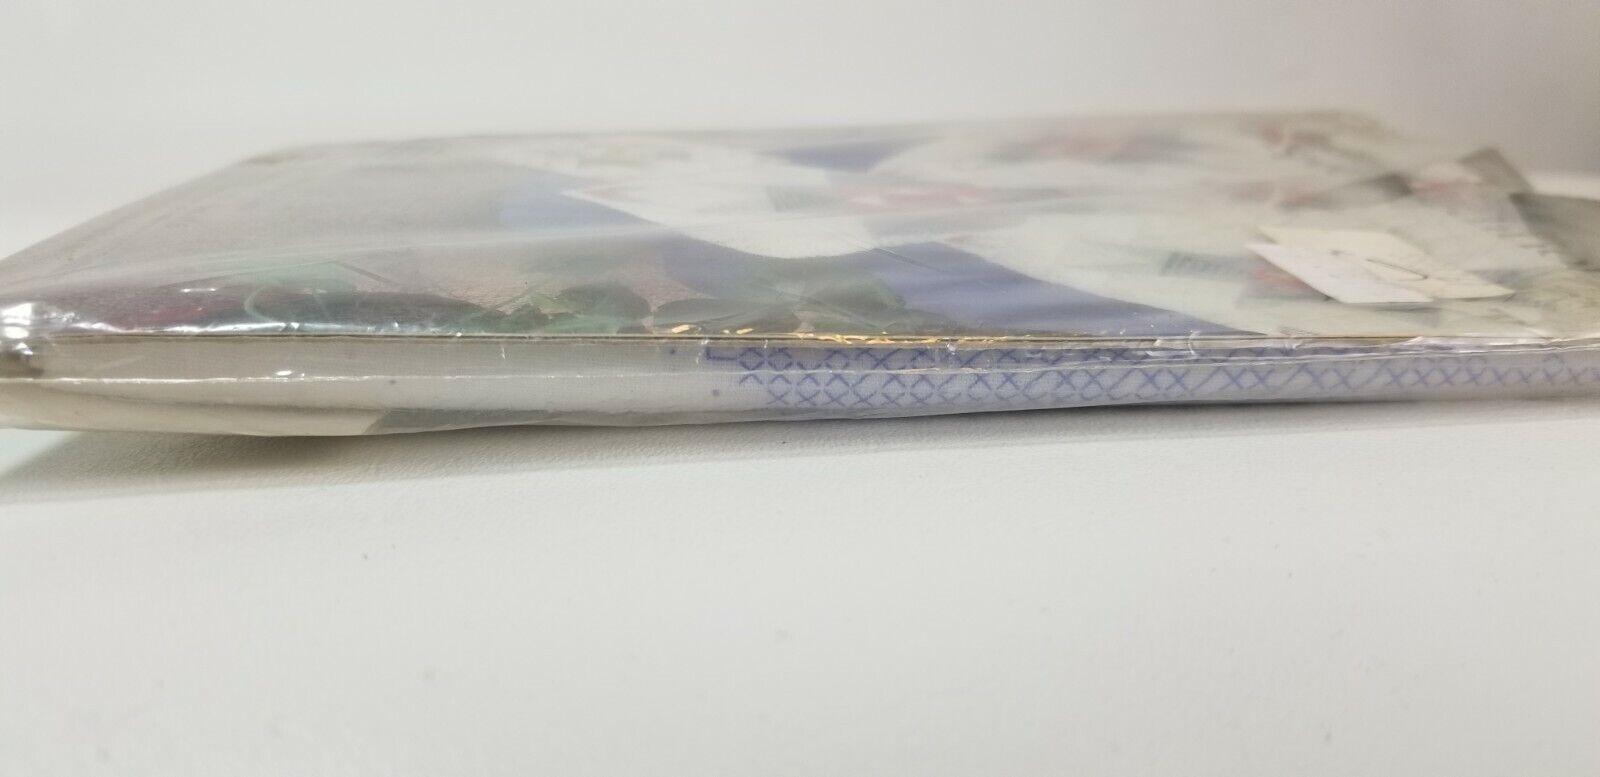 Bucilla Special Edition Quilt Blocks 15 X 15 Set Of 6 Starburst 64518 NIP - $13.95